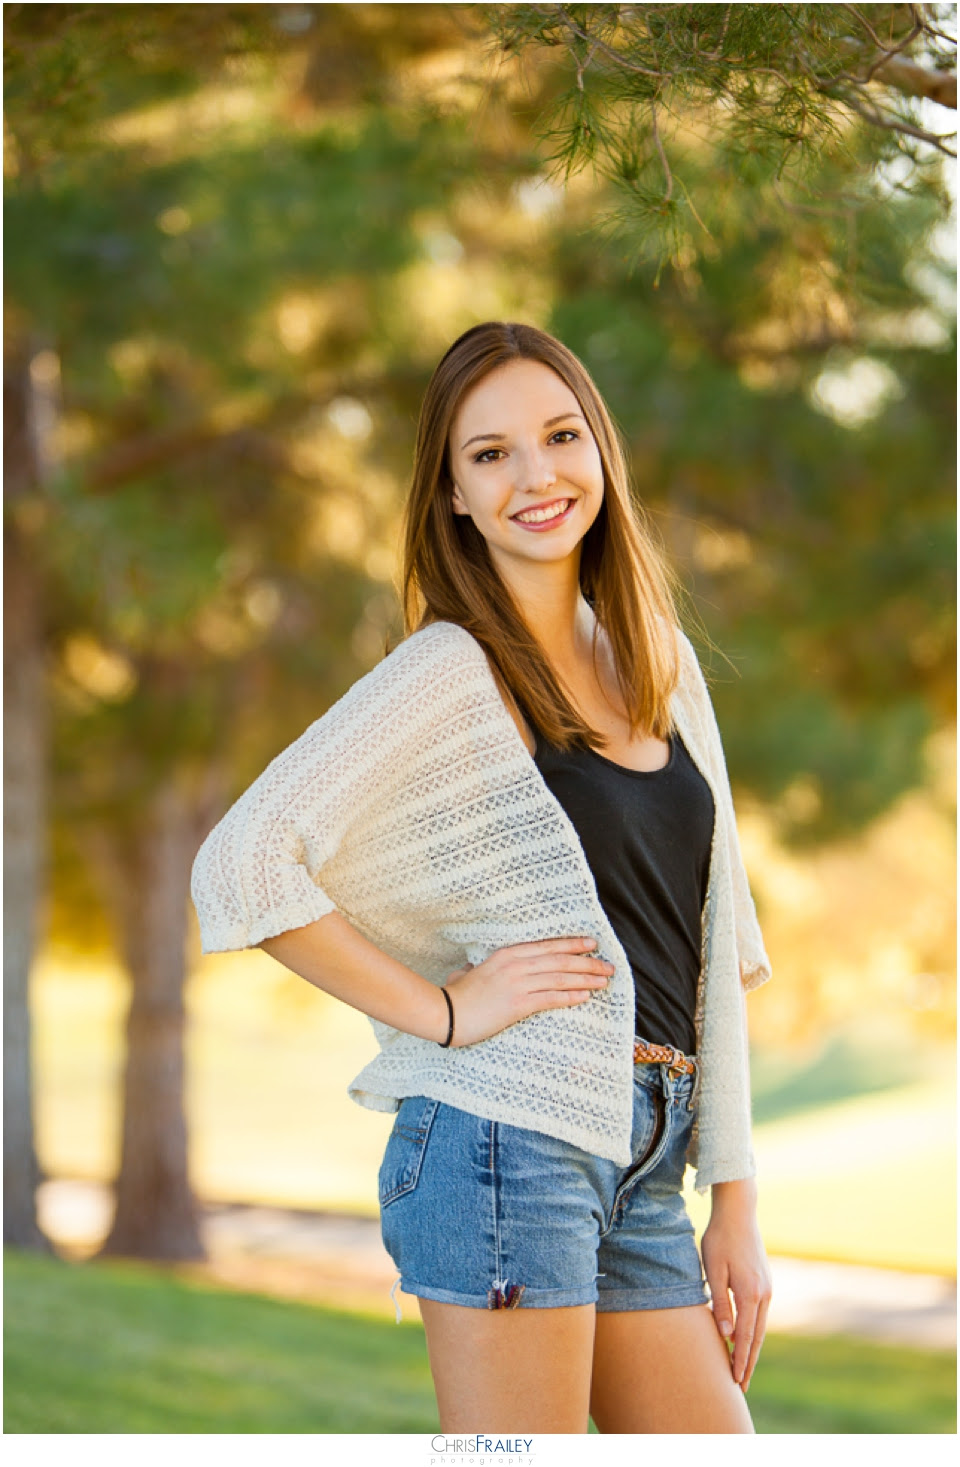 Haley | Outdoor Senior Portraits